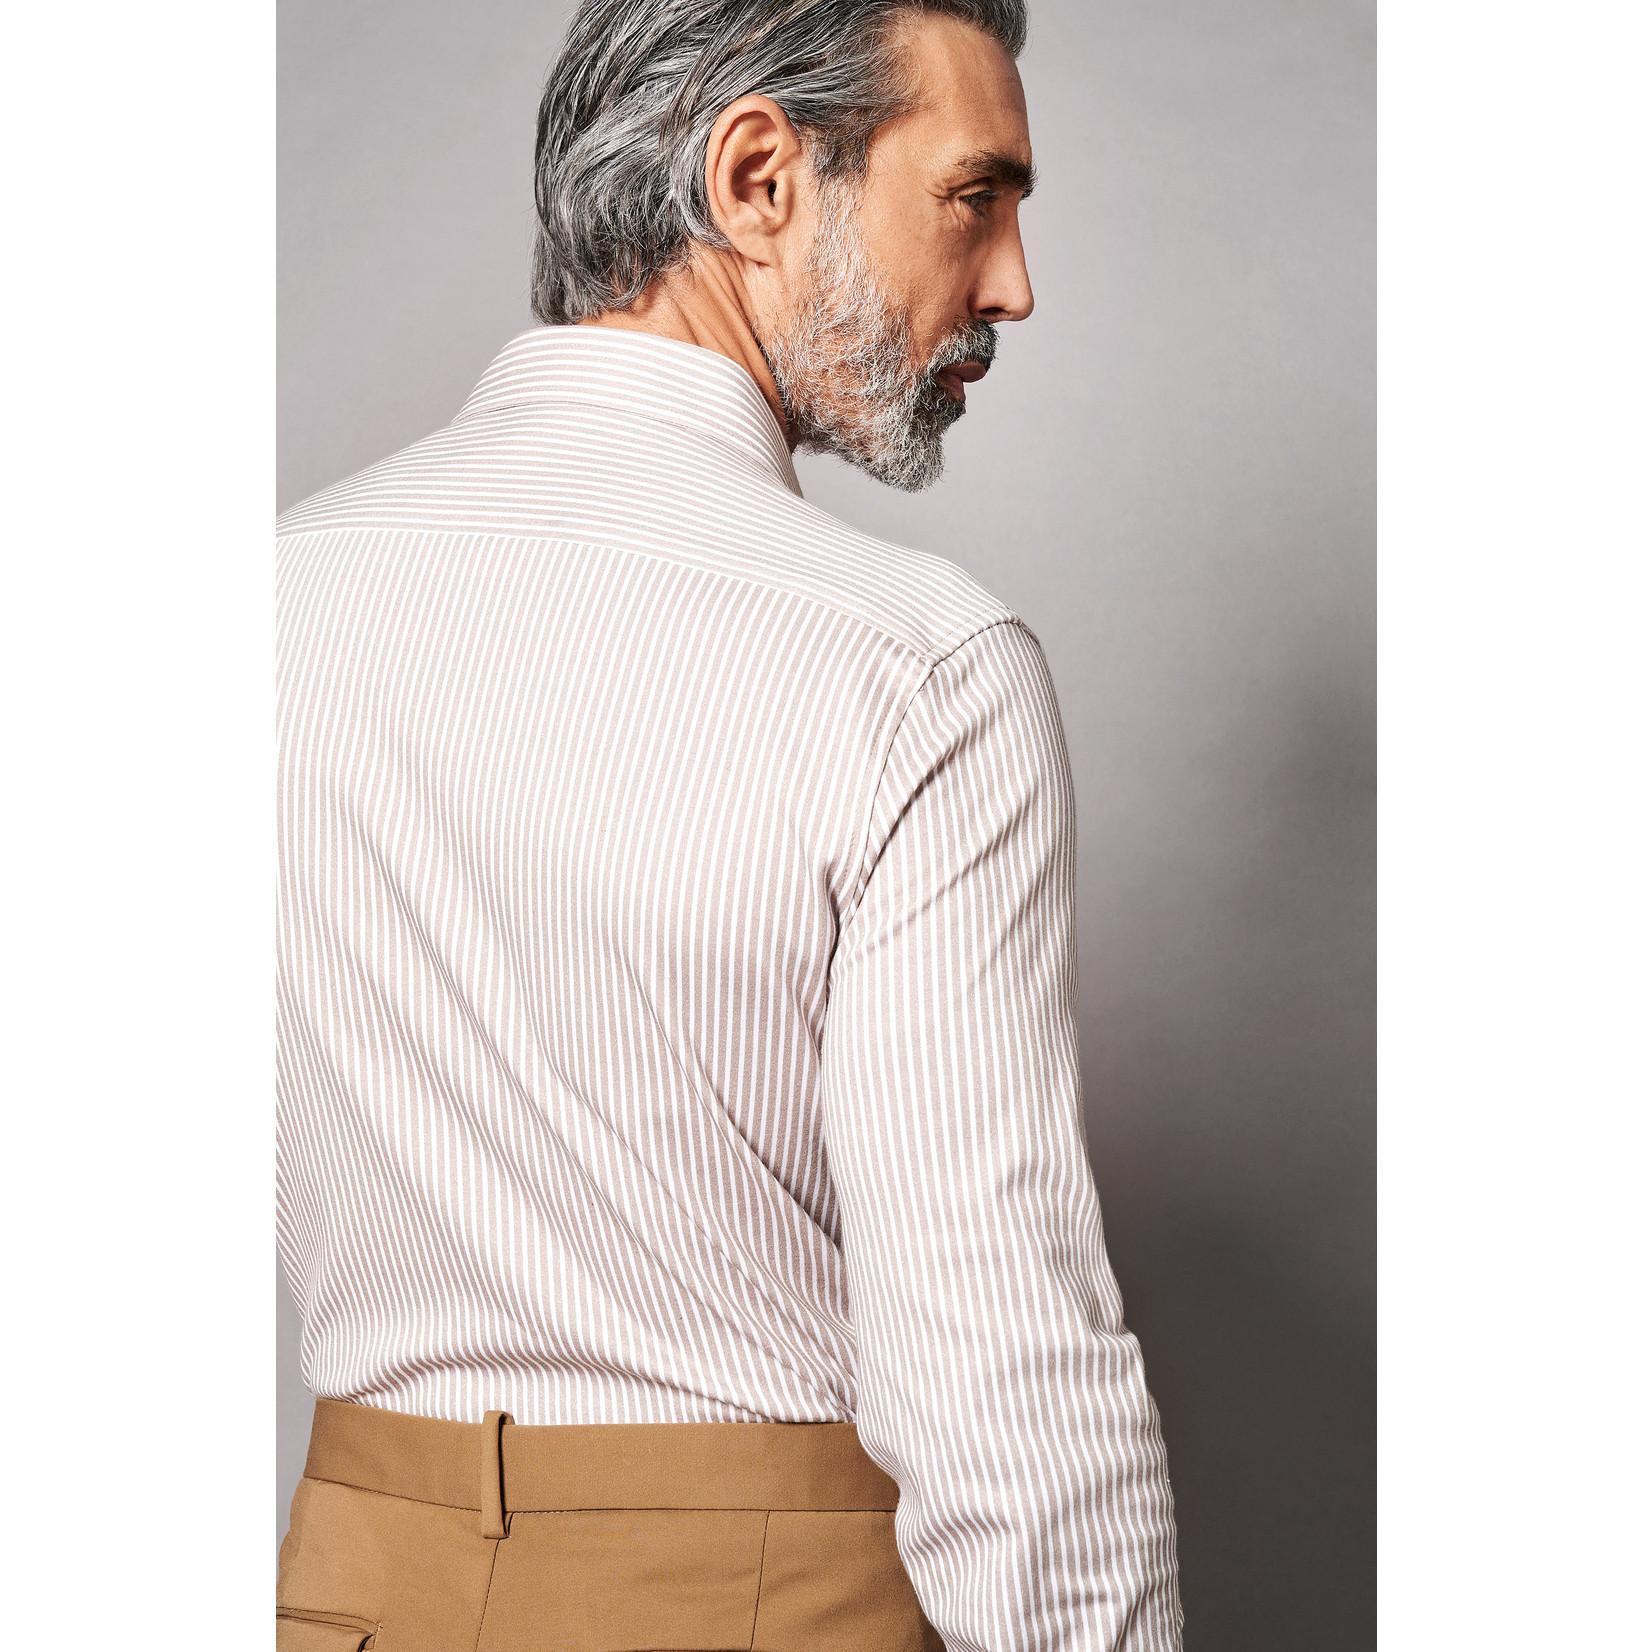 Desoto Luxury jersey overhemd beige streep